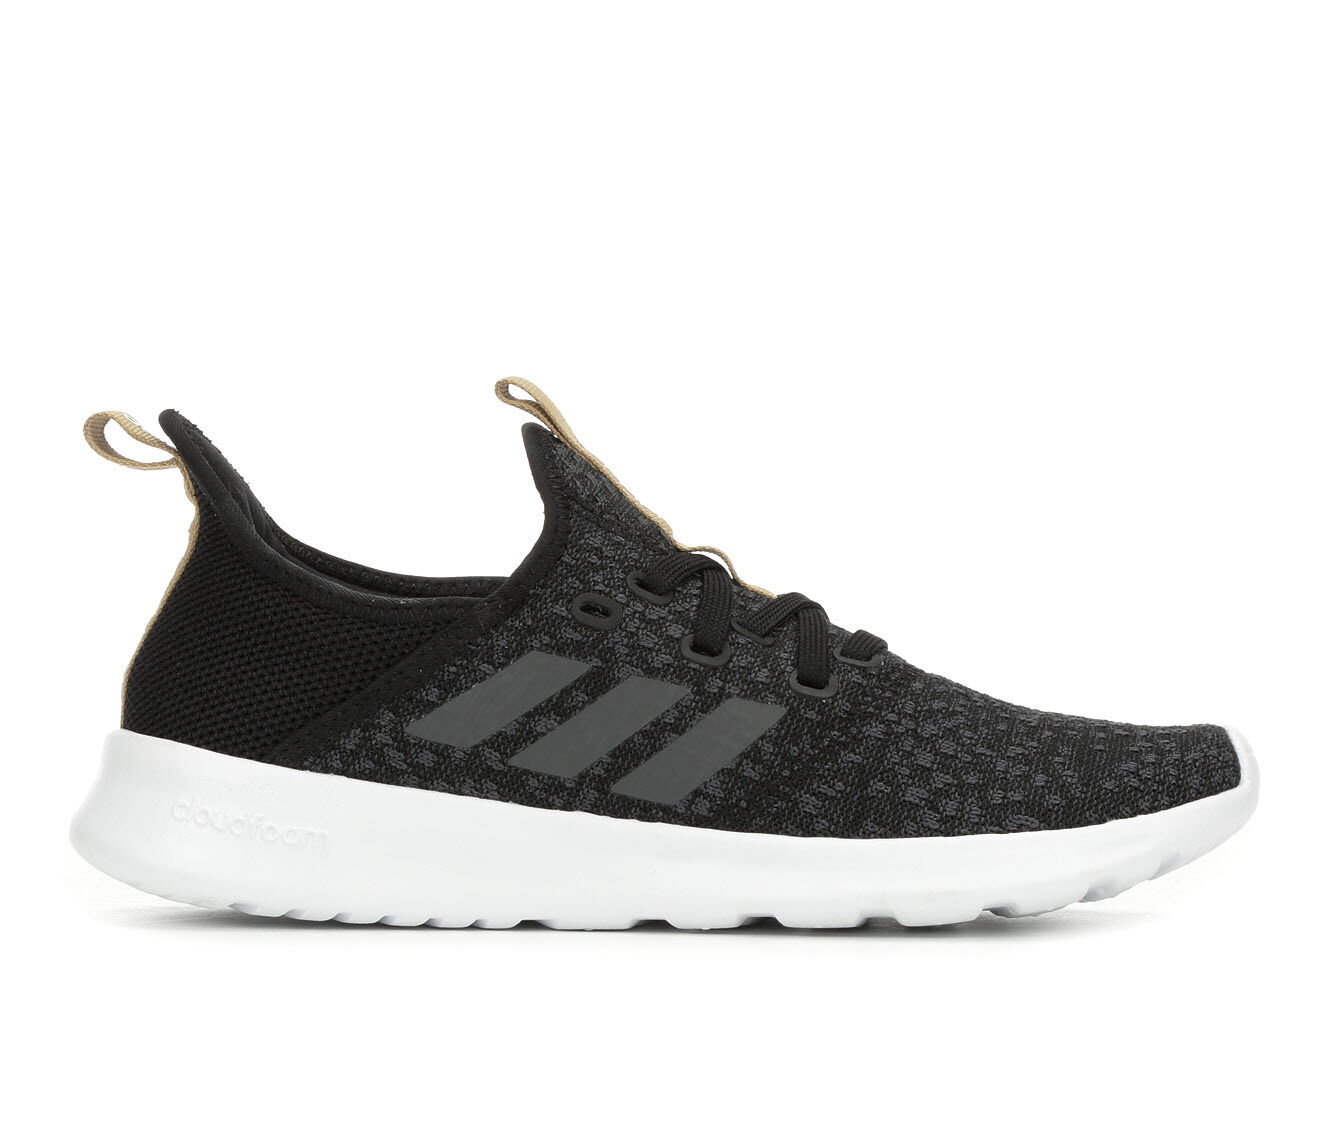 uk shoes_kd4541